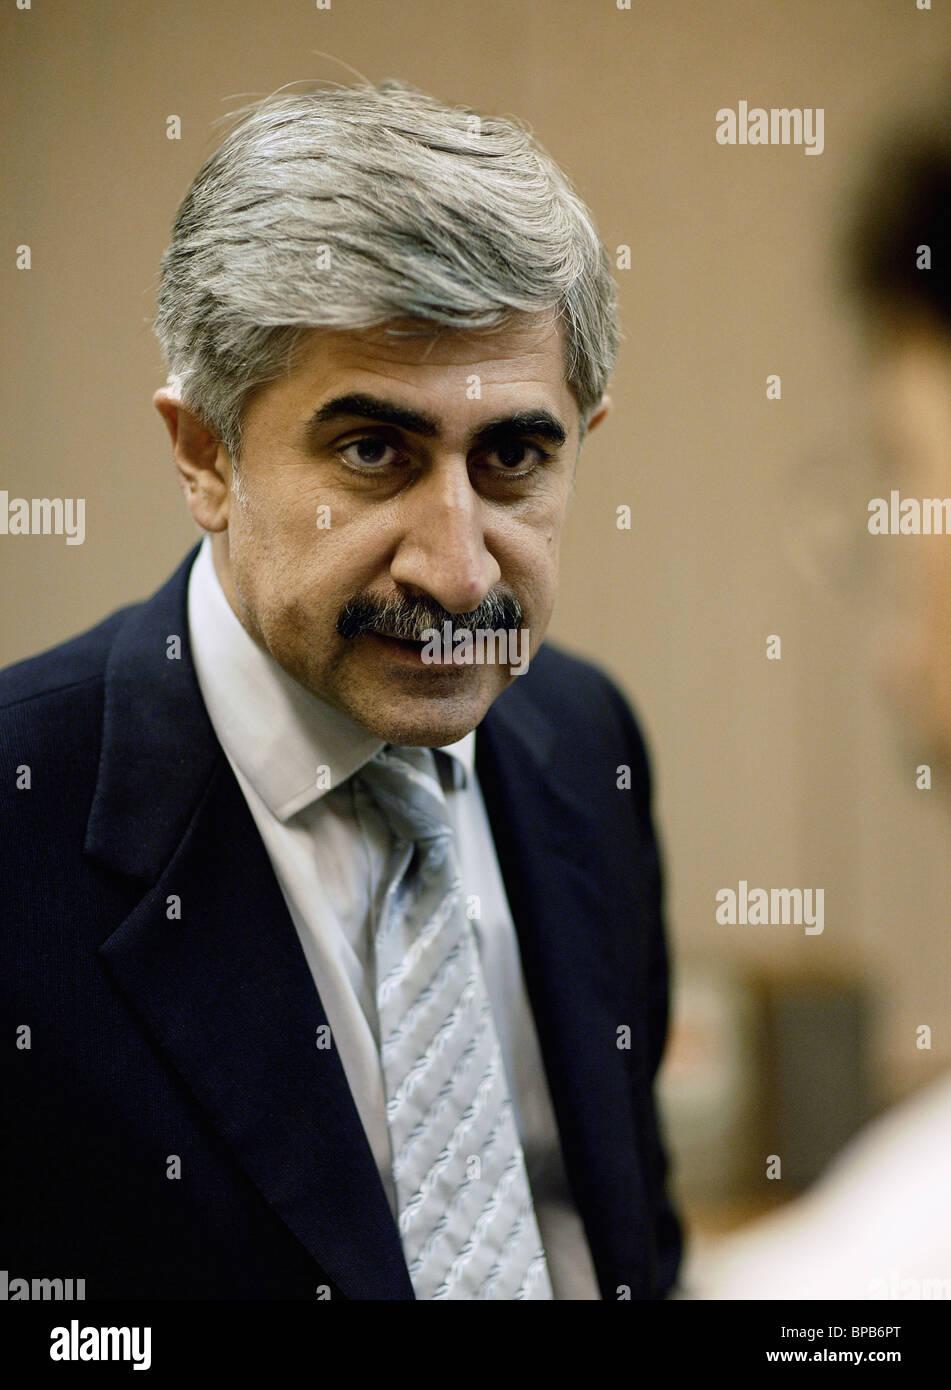 Generaldirektor der Sukhoy Aviation Holding Company (AKhK) Michail Pogosjan Stockbild